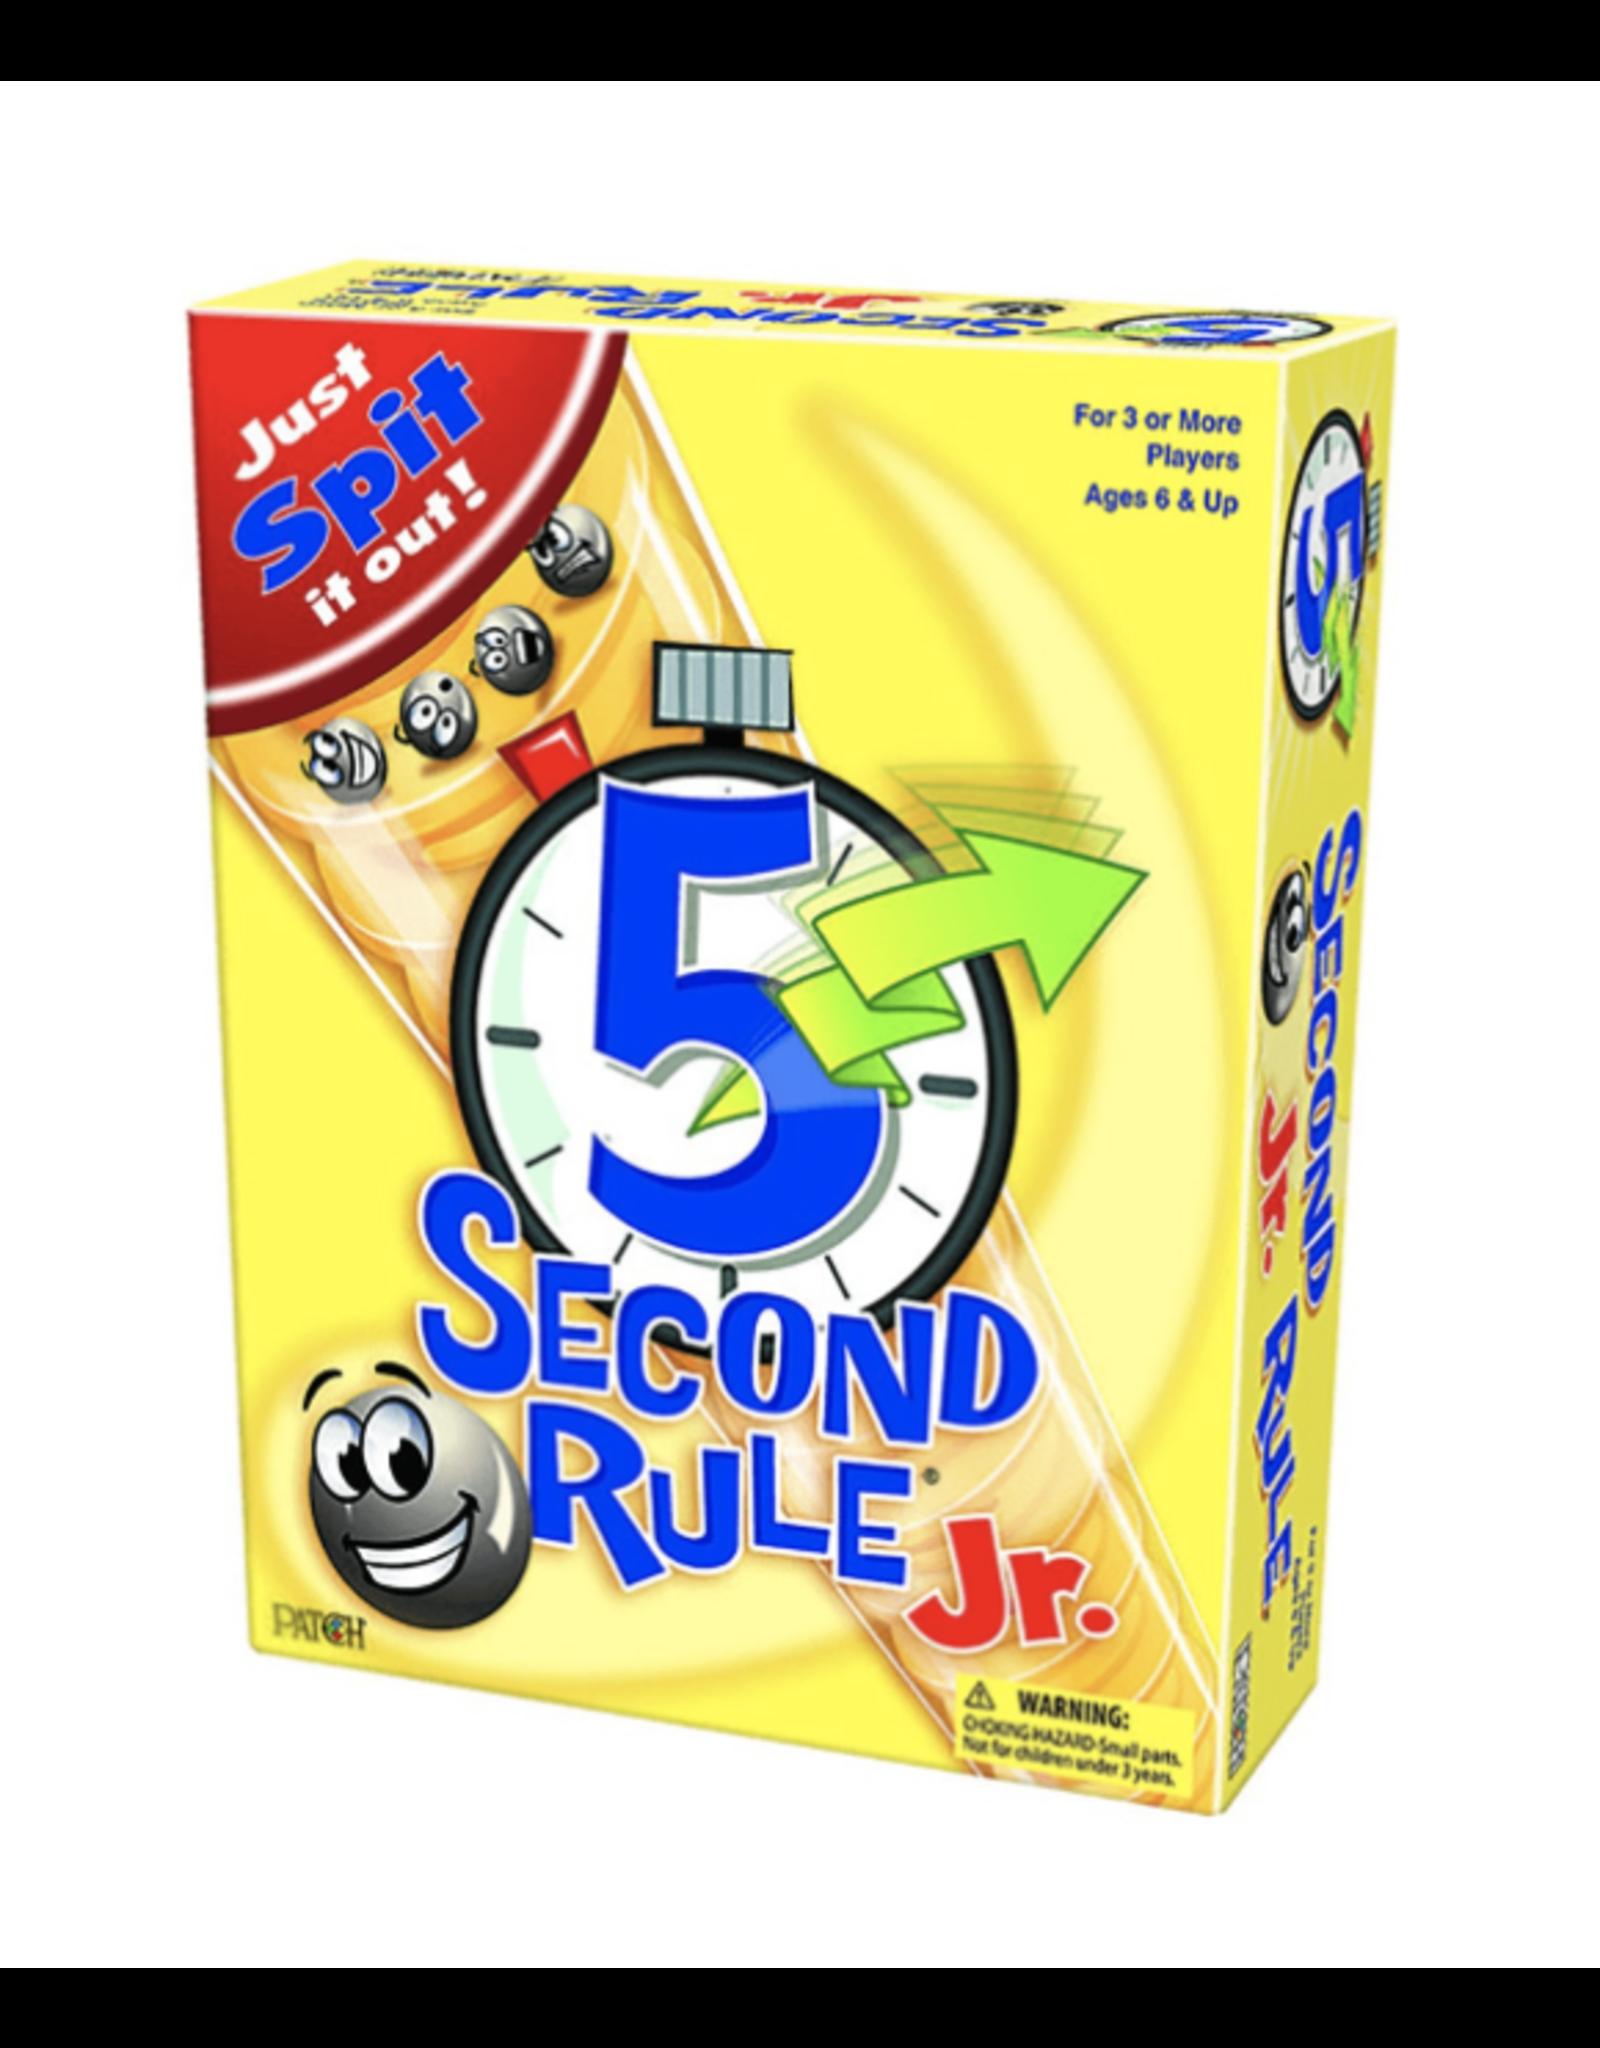 Play Monster 5 Second Rule Jr